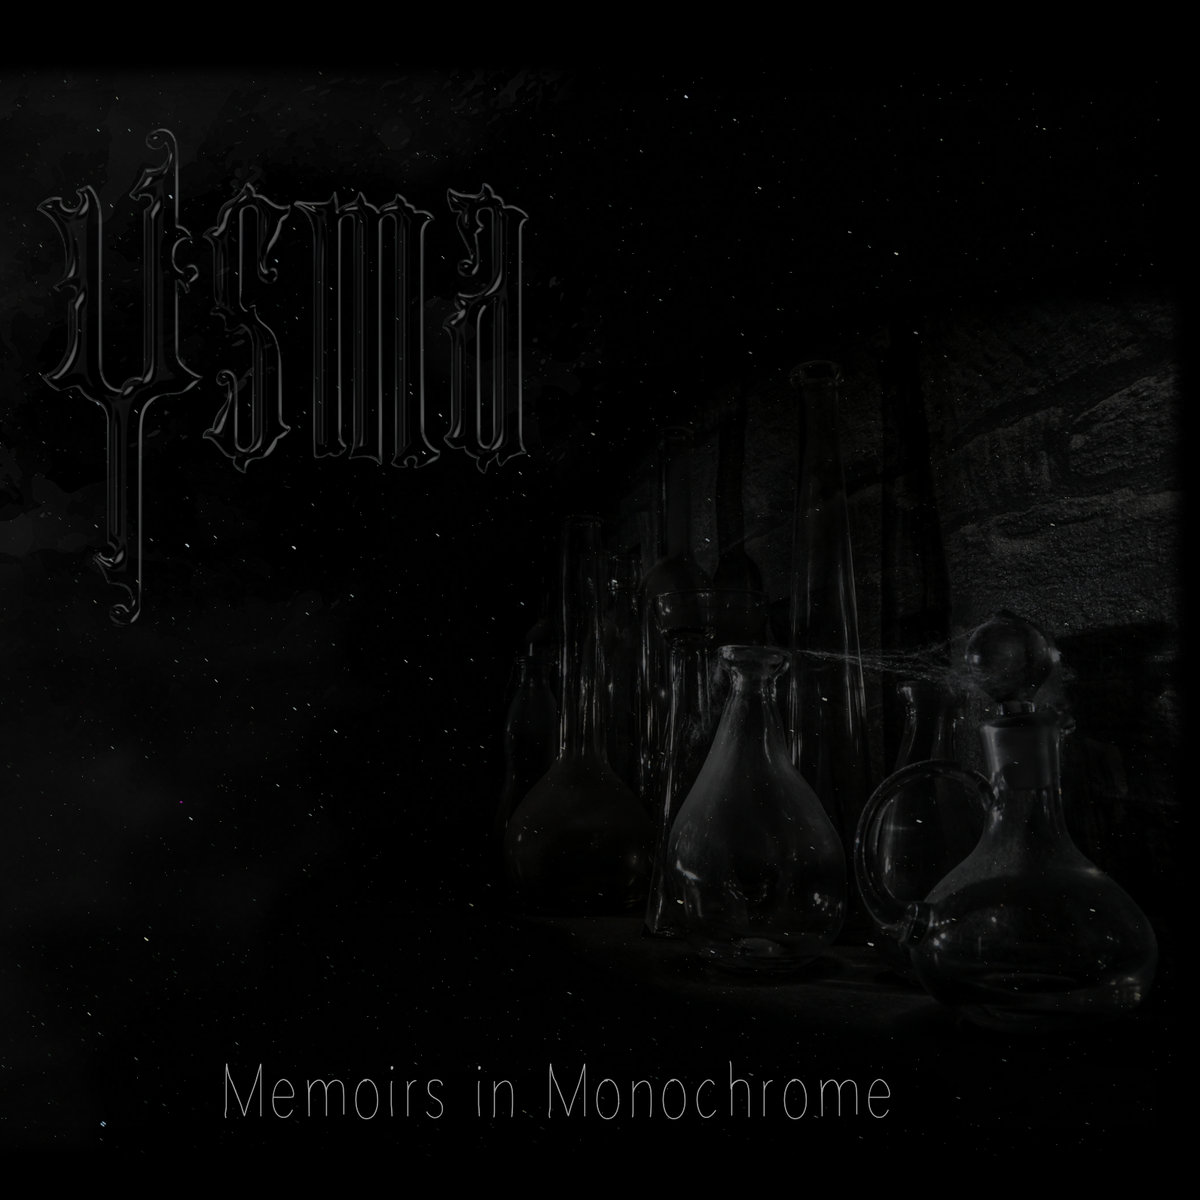 Ysma: Memoirs in Monochrome